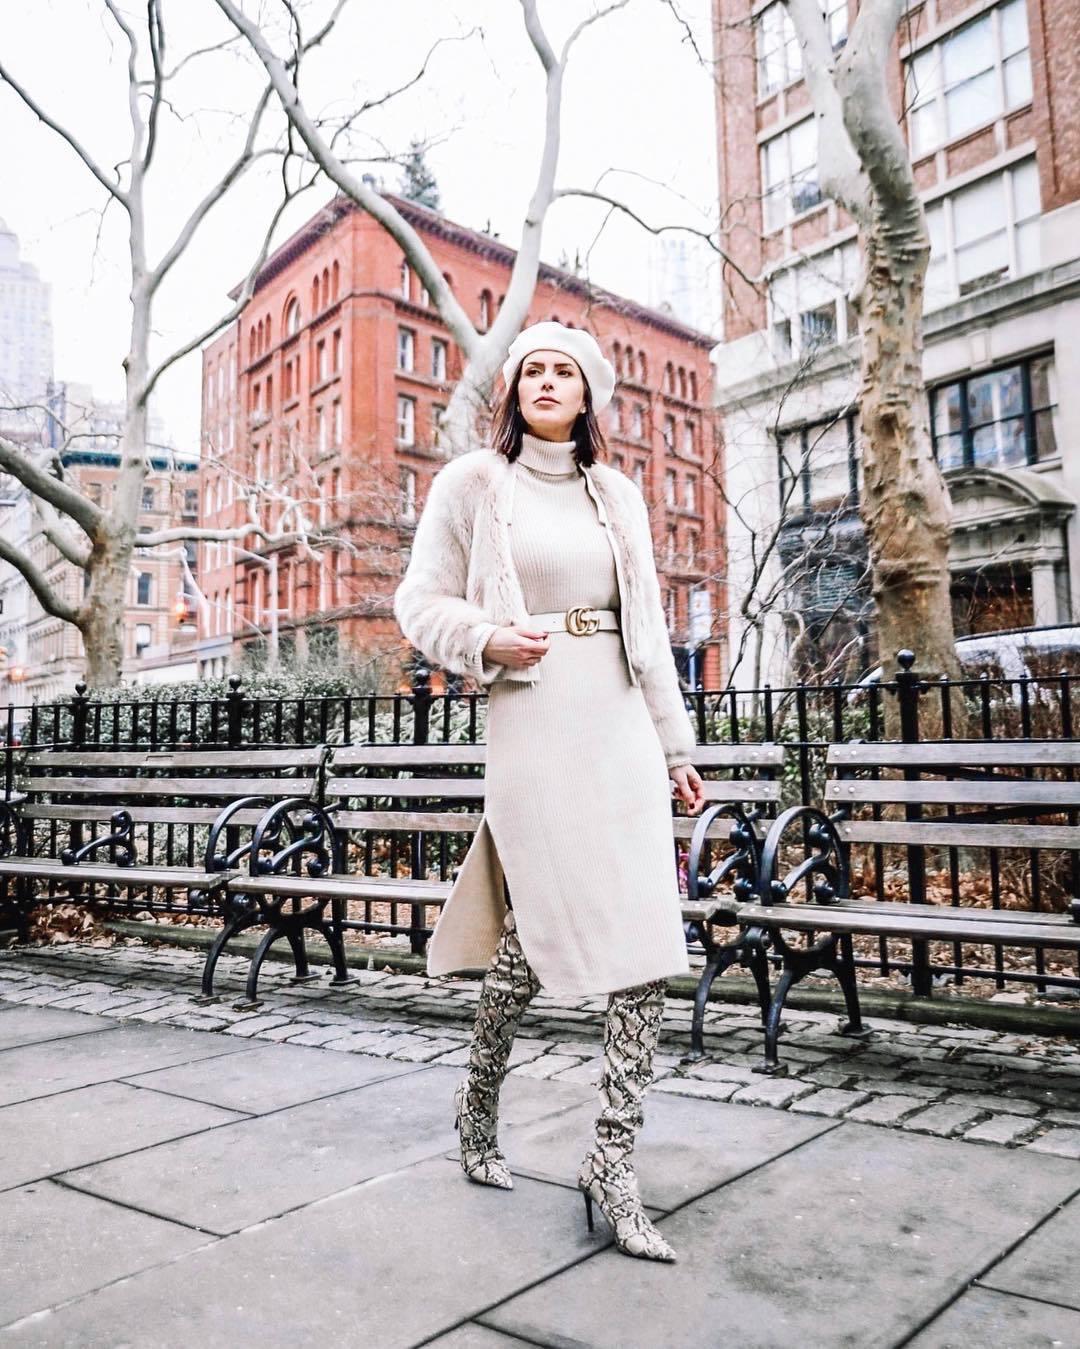 dress turtleneck dress midi dress knitted dress over the knee boots snake print heel boots gucci belt teddy jacket beret